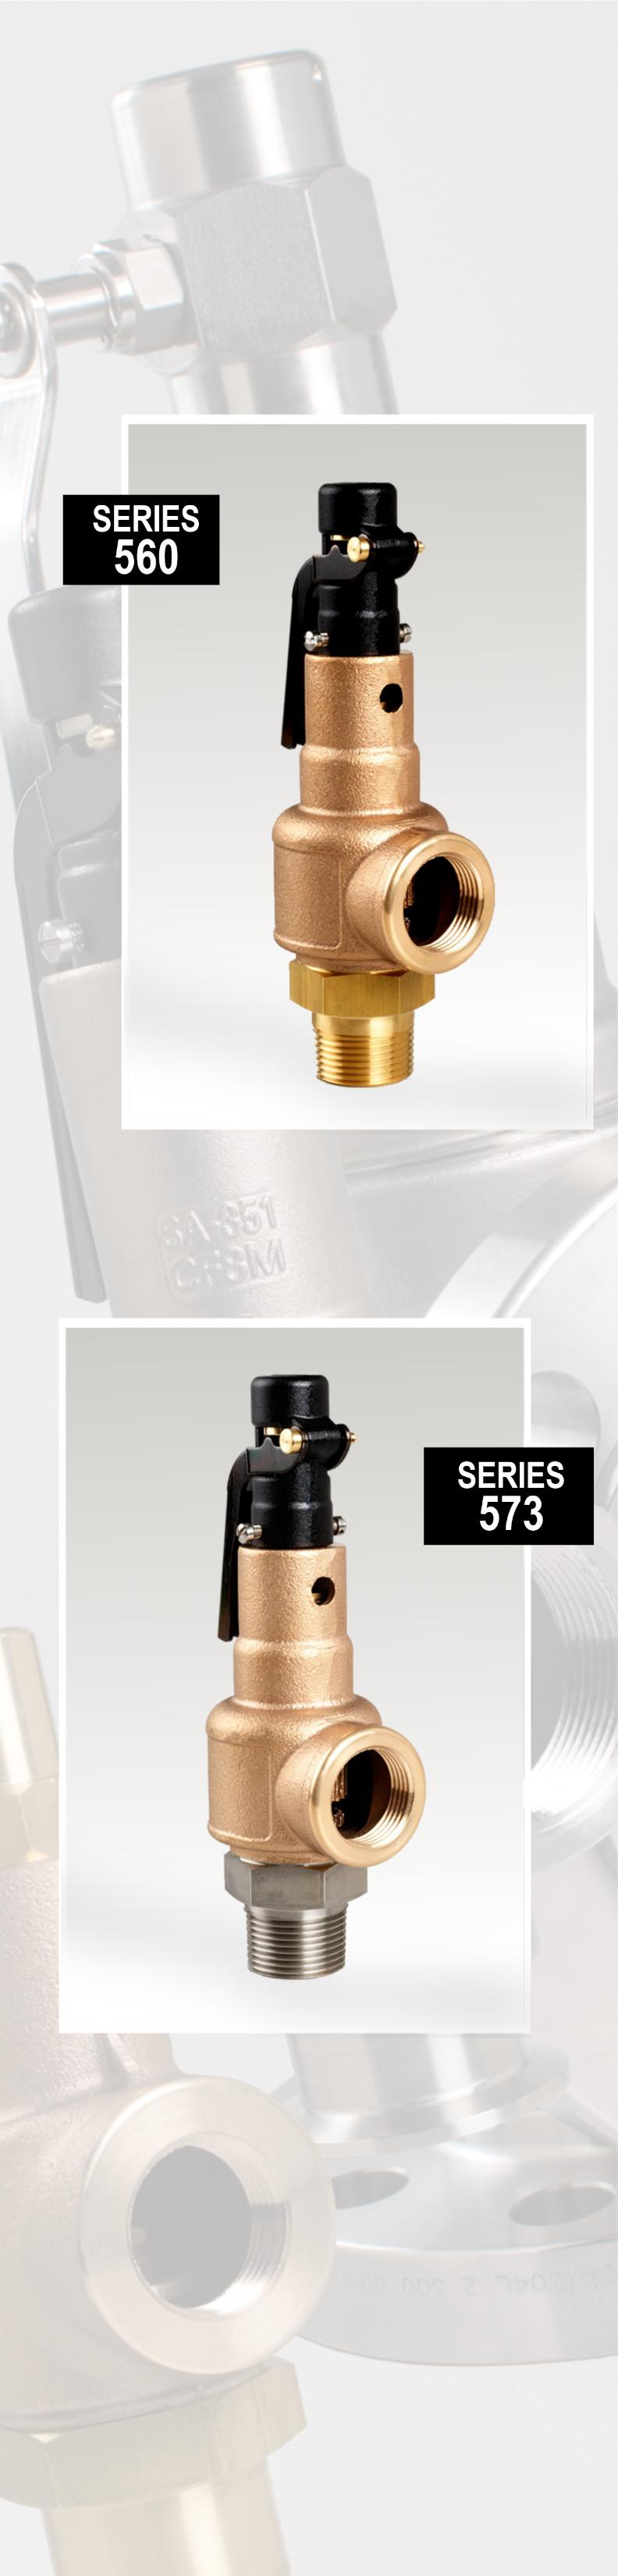 250 psi 1-1//2 x 2 AQUATROL 570HG-MA250 Safety Valve for Series 570 1-1//2 x 2